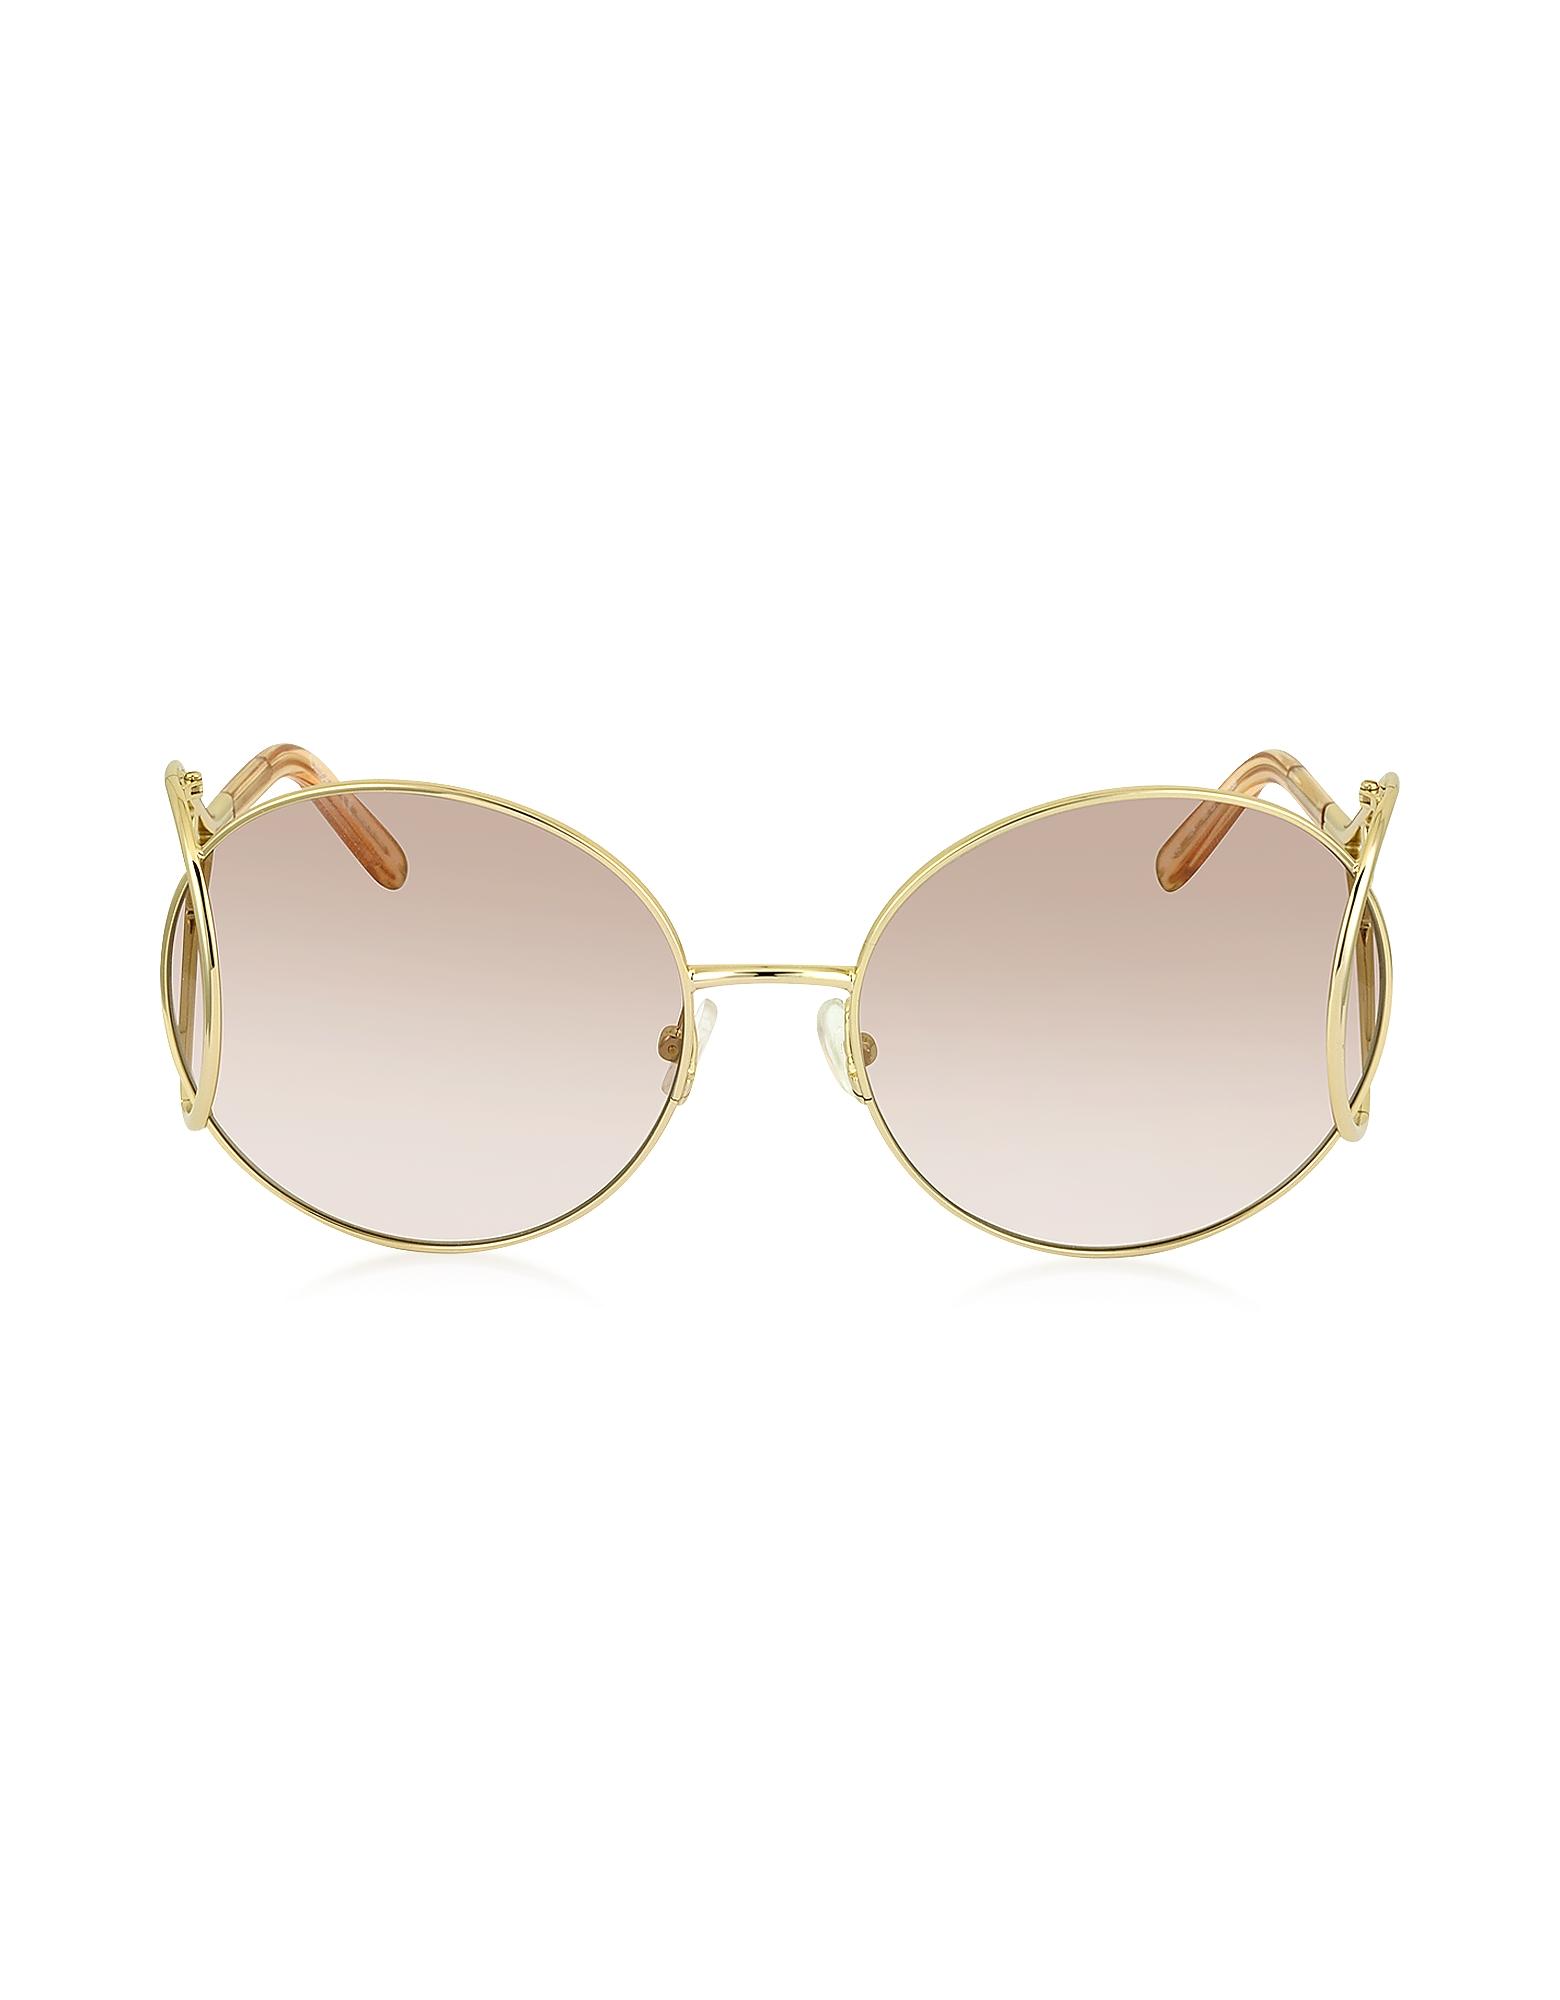 Chloe Sunglasses, JACKSON CE 124S Metal Round Women's Sunglasses